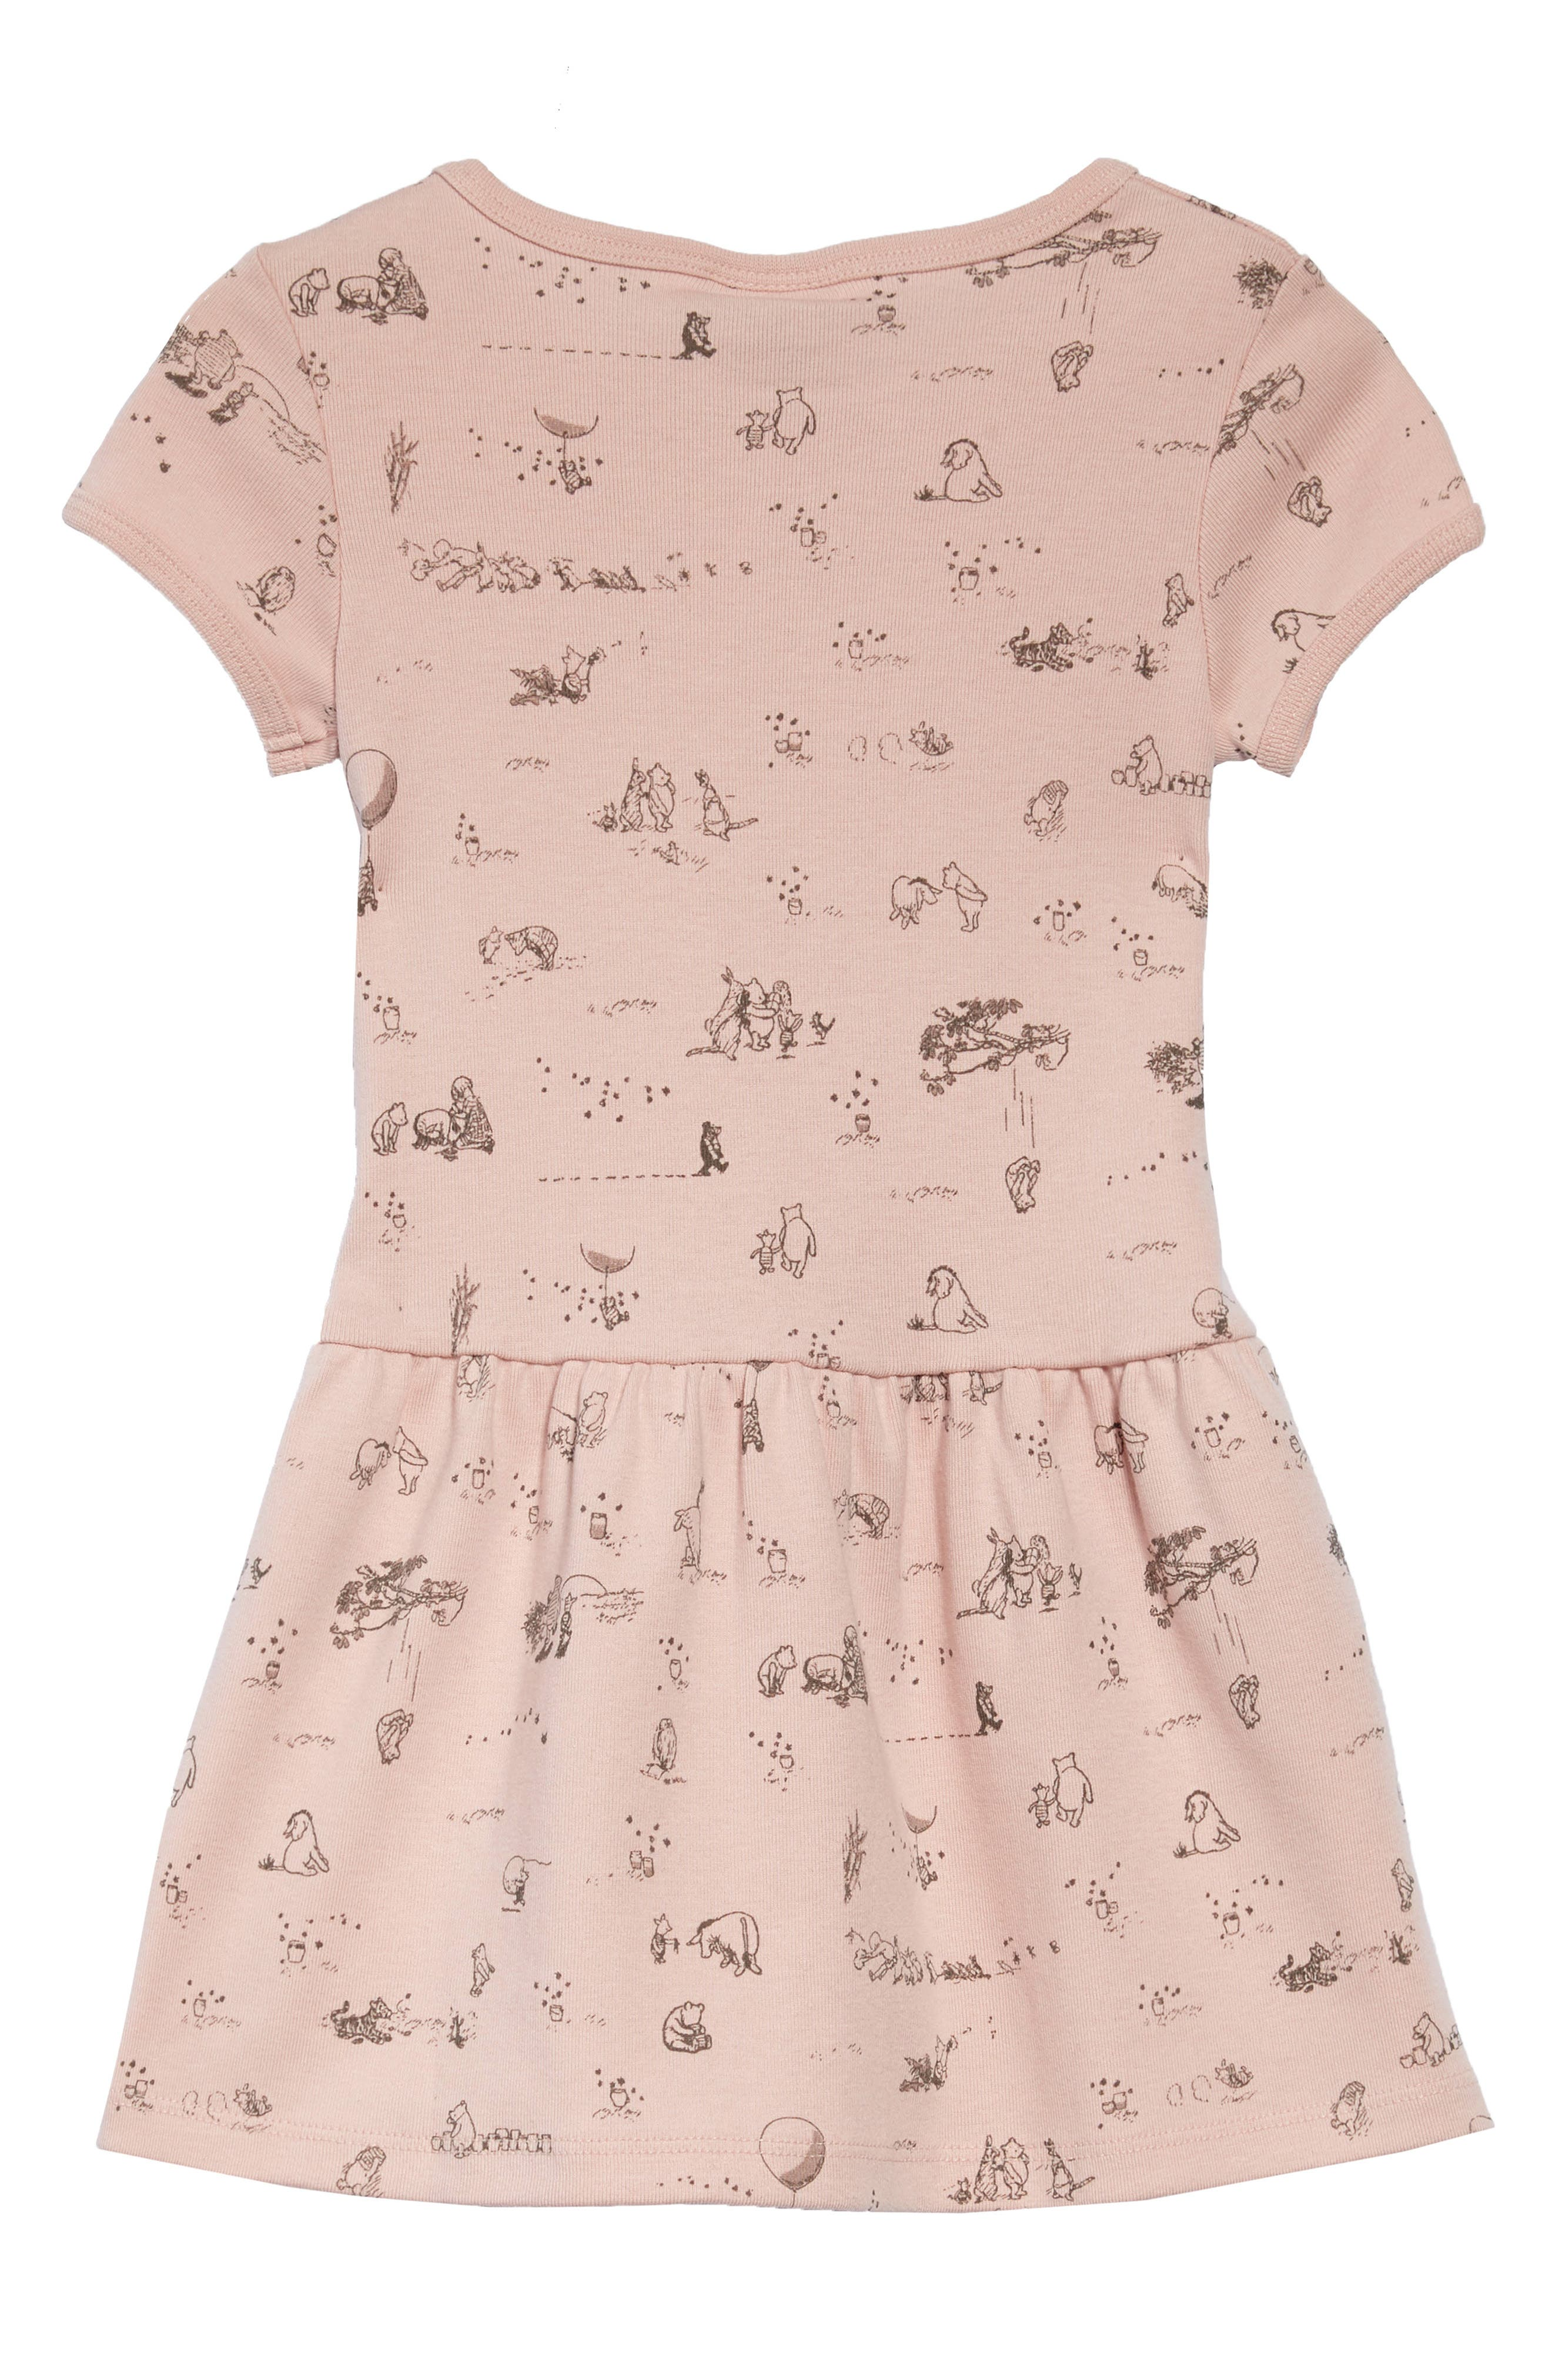 x Disney<sup>®</sup> Winnie the Pooh Print Dress,                             Alternate thumbnail 2, color,                             Powder